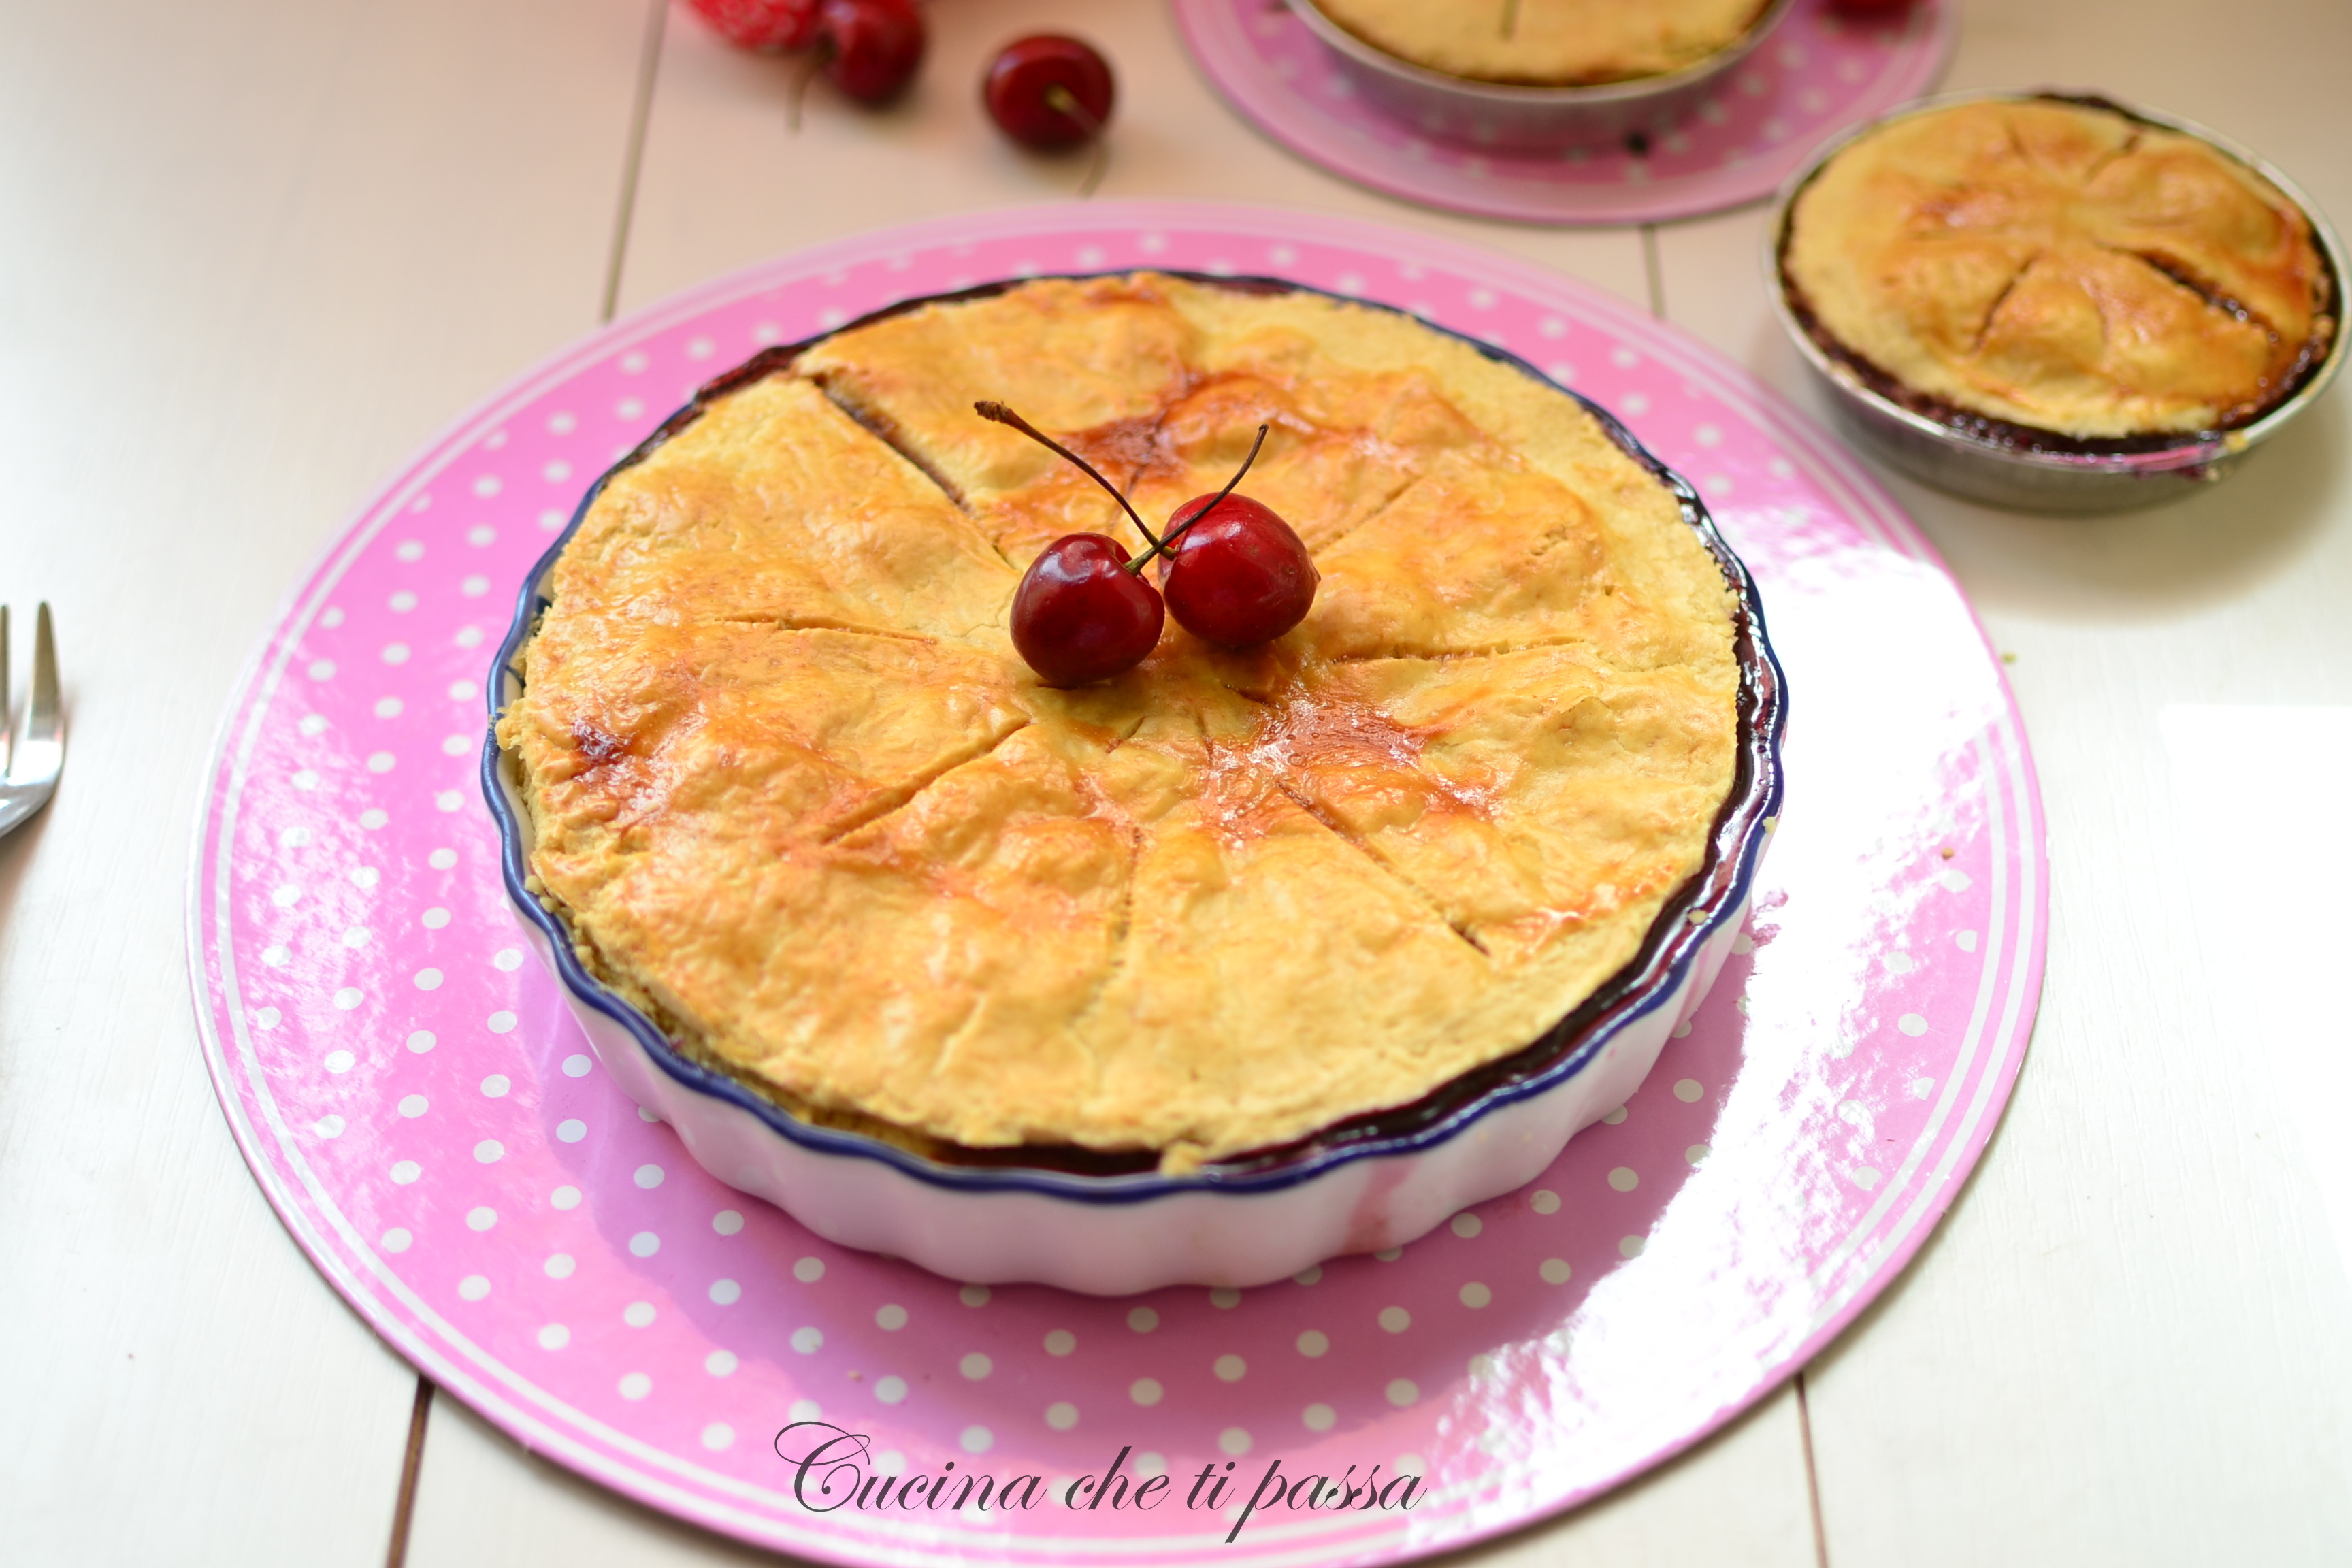 CherryPie – Torta di ciliegie